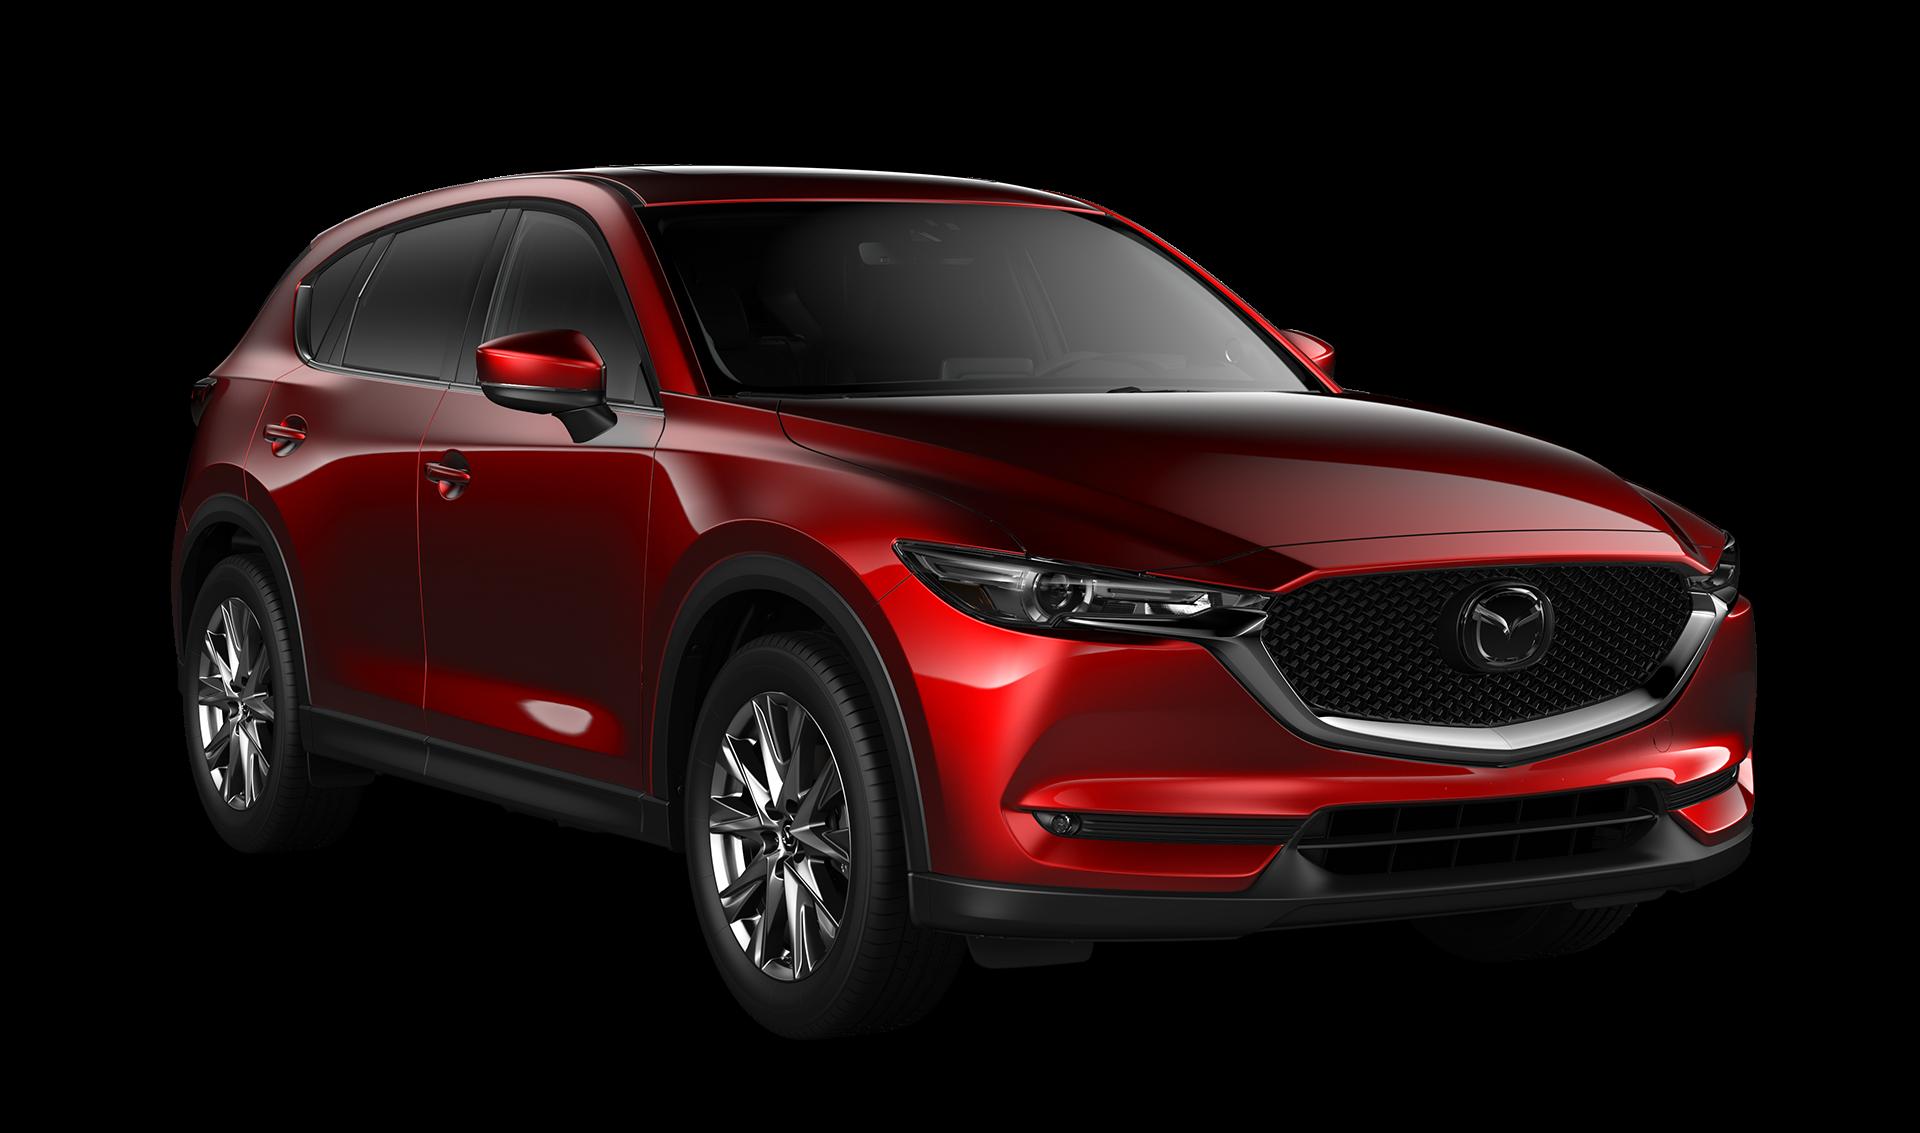 Mazda CX-5 2019 Signature